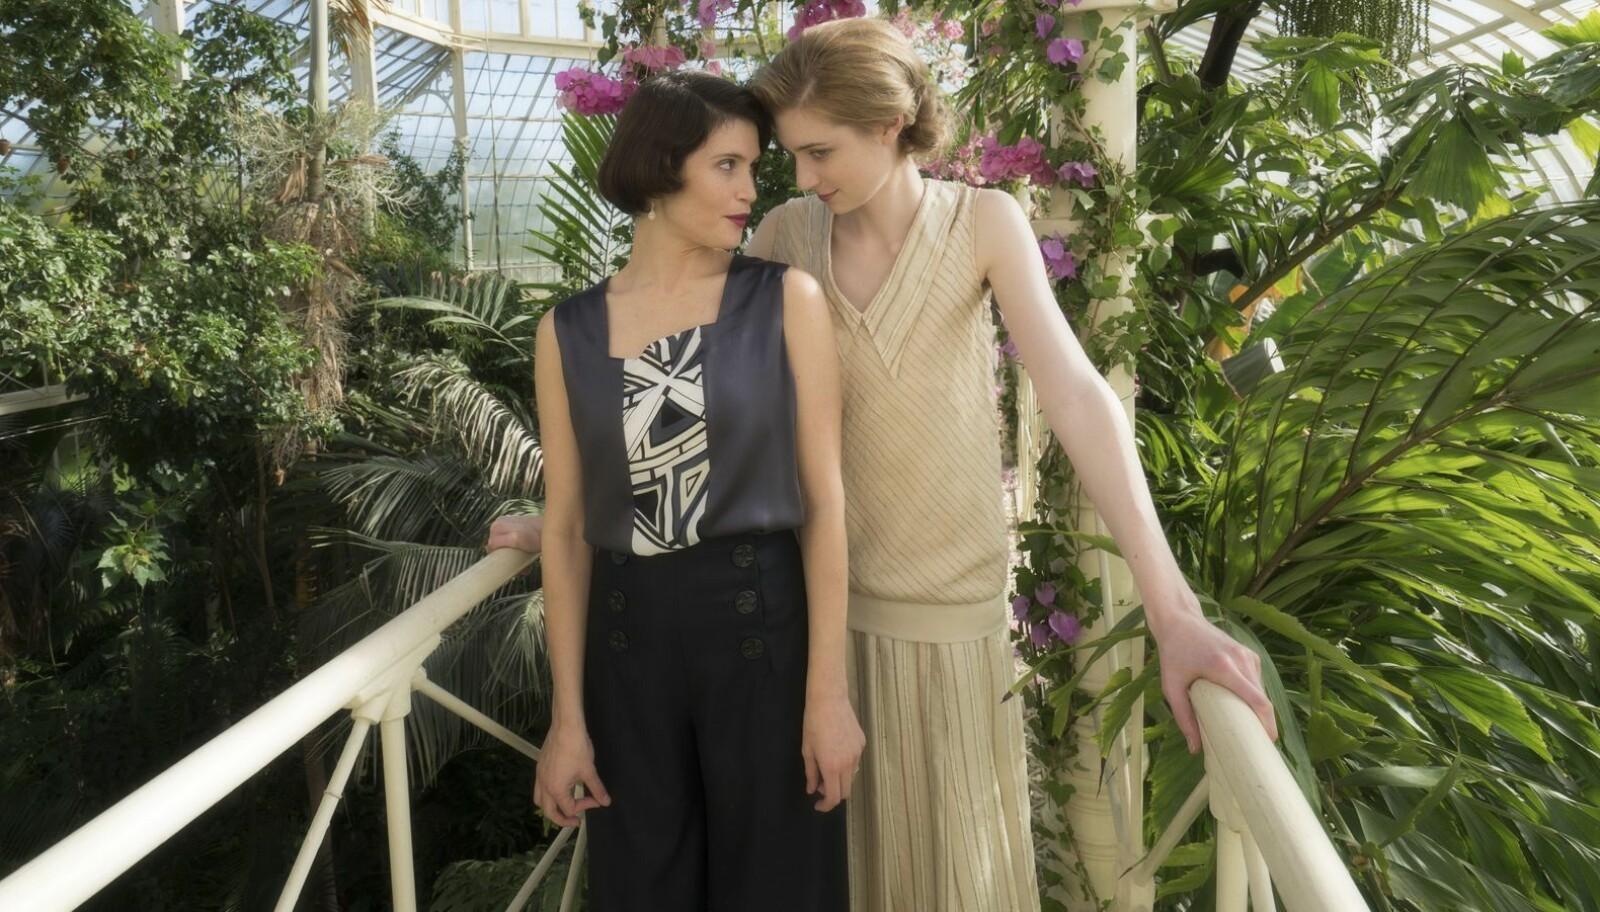 Gemma Arterton spiller Vita Sackville-West (t.h.) og Elizabeth Debicki har rollen som Virginia Woolf. Isabella Rossellini spiller Lady Sackville, mora til Vita.